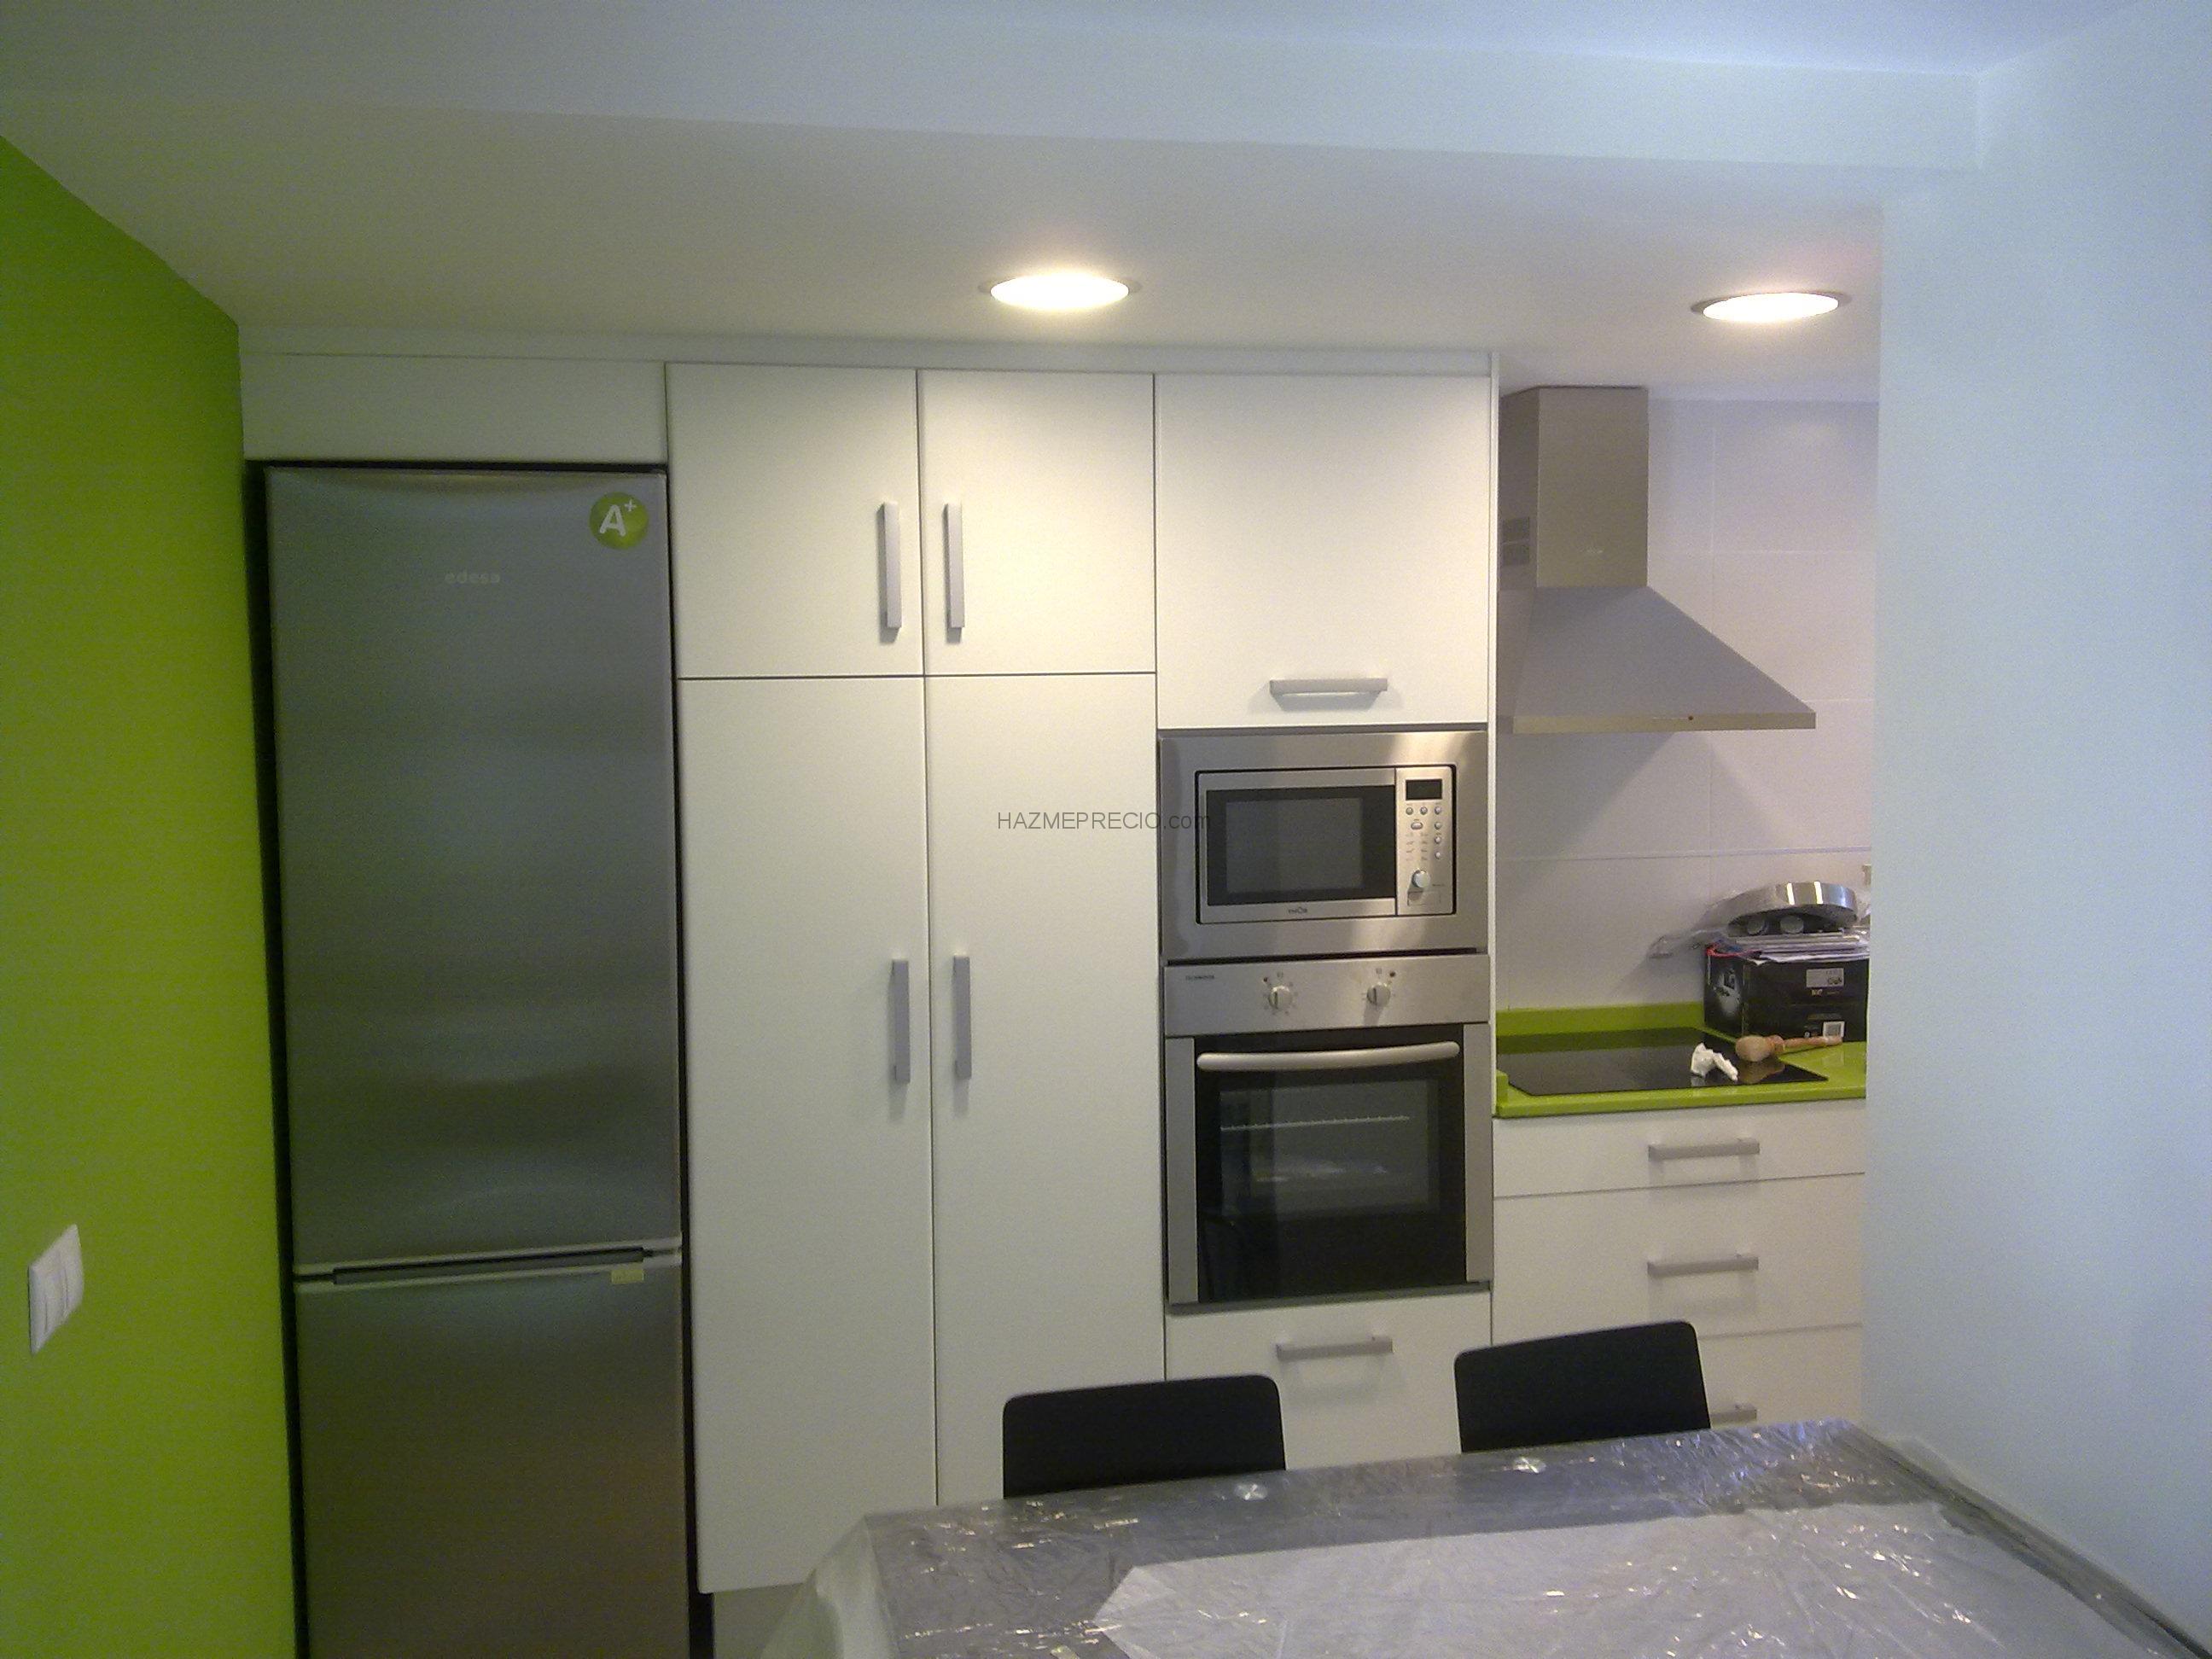 reforma integral de apartamento de 45 m2 mislata